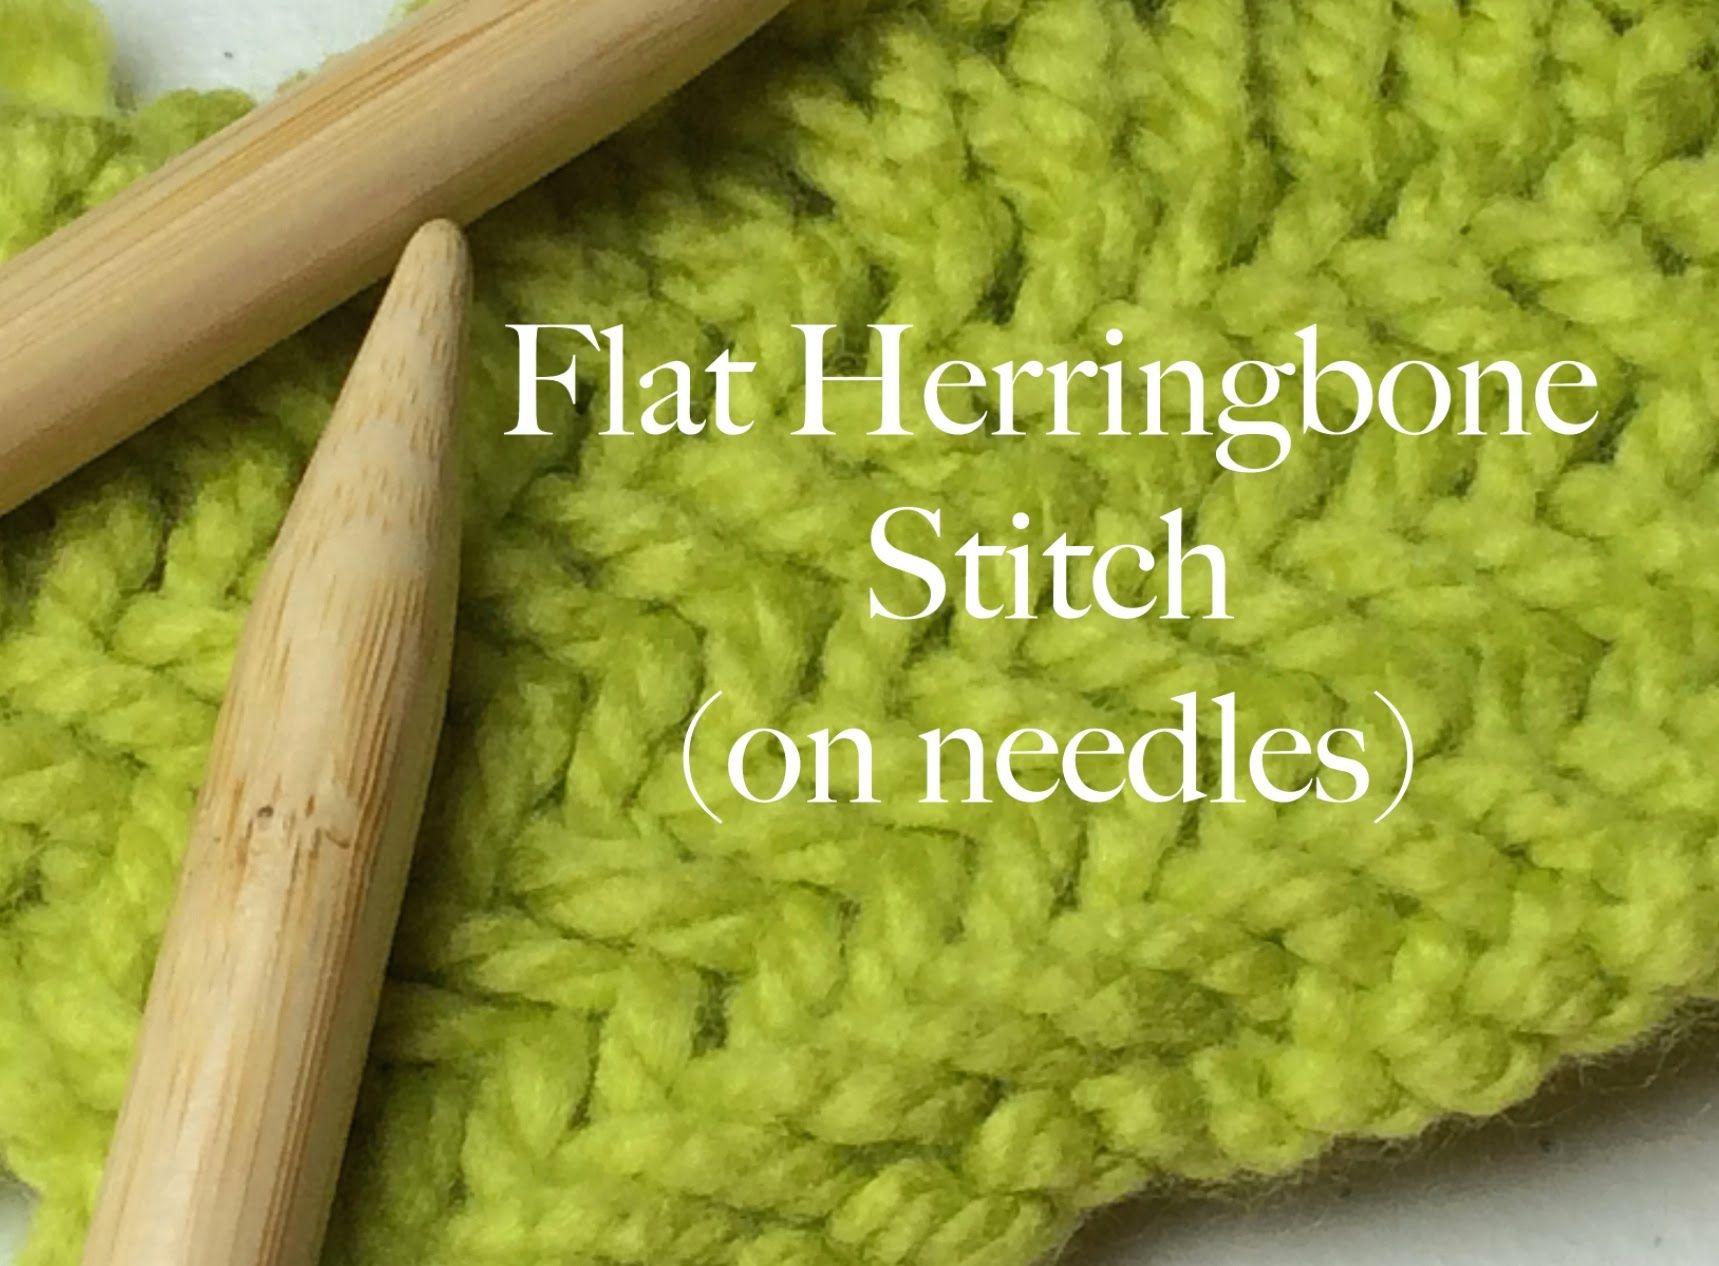 Flat Herringbone Stitch on Needles - How to Knit